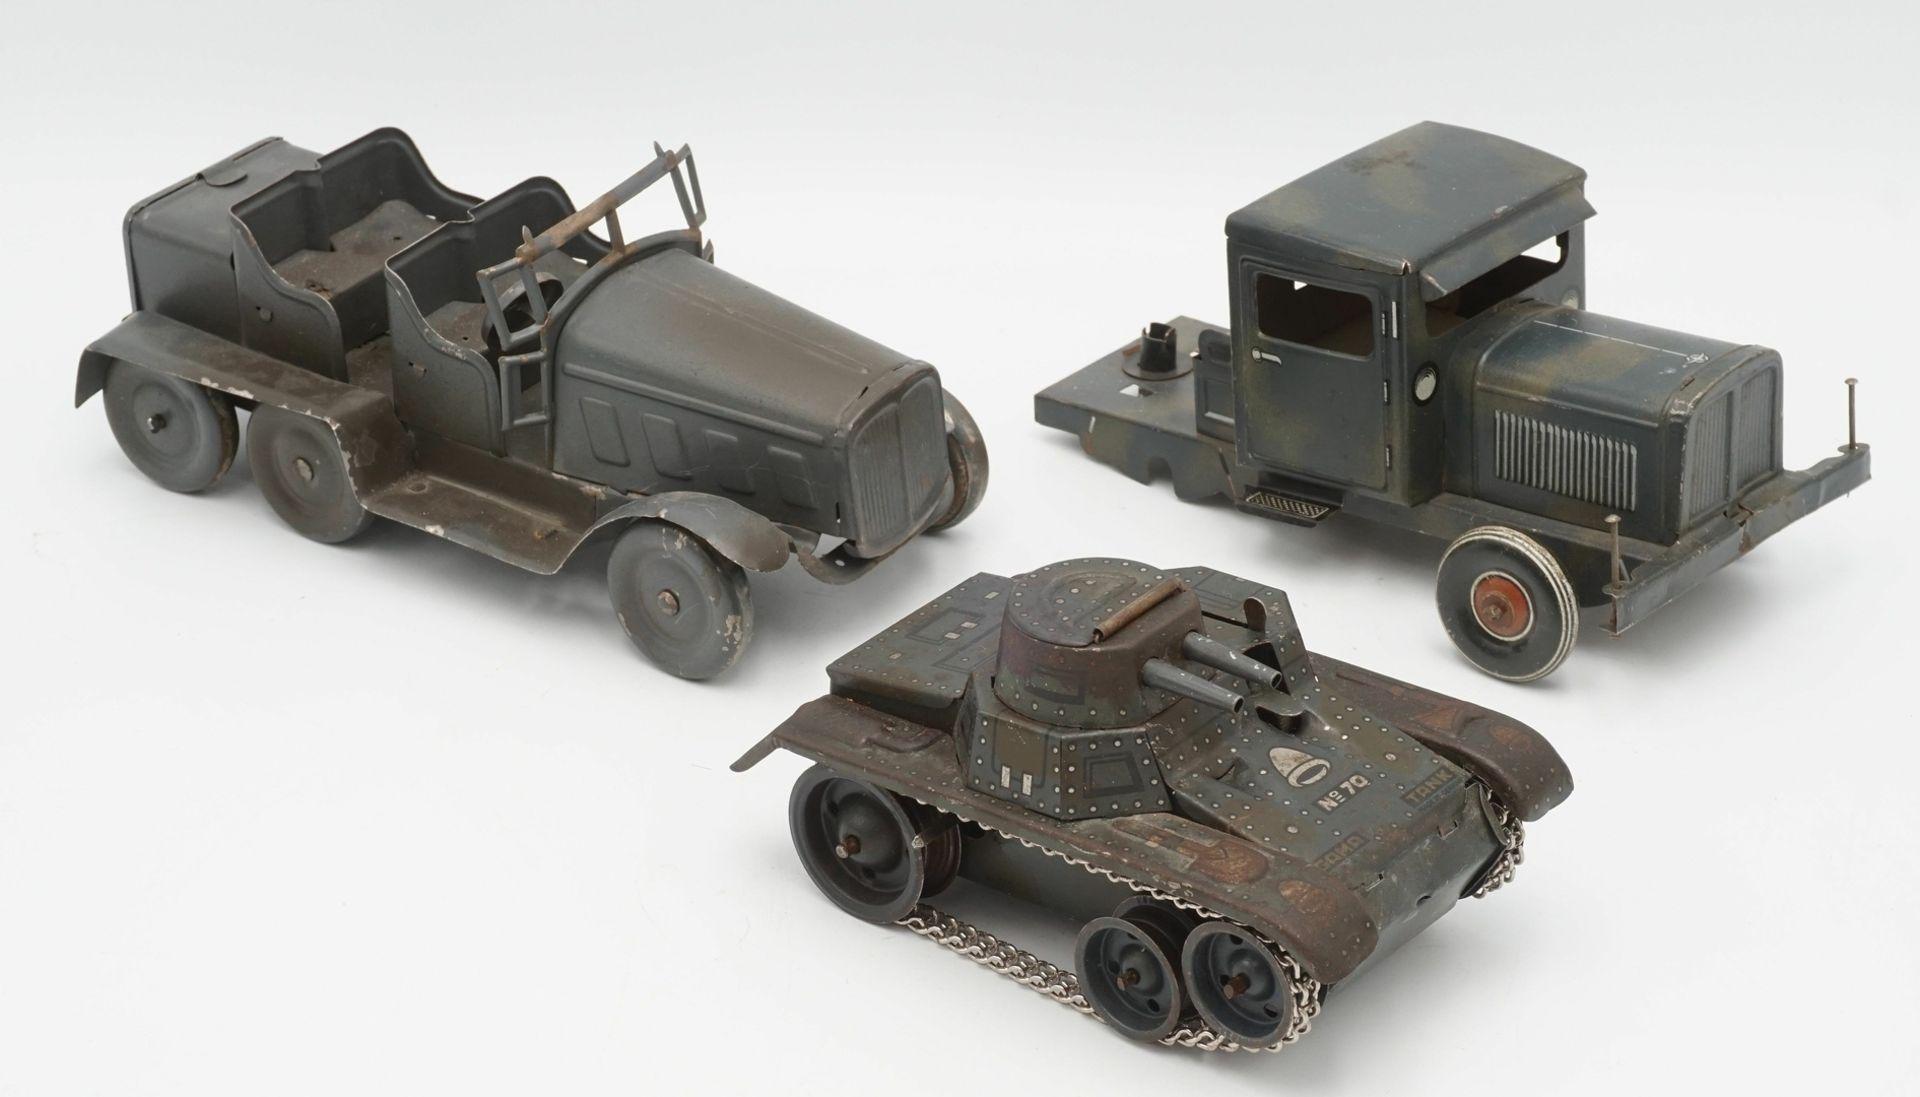 Zwei Blechautos und ein Blech Panzer